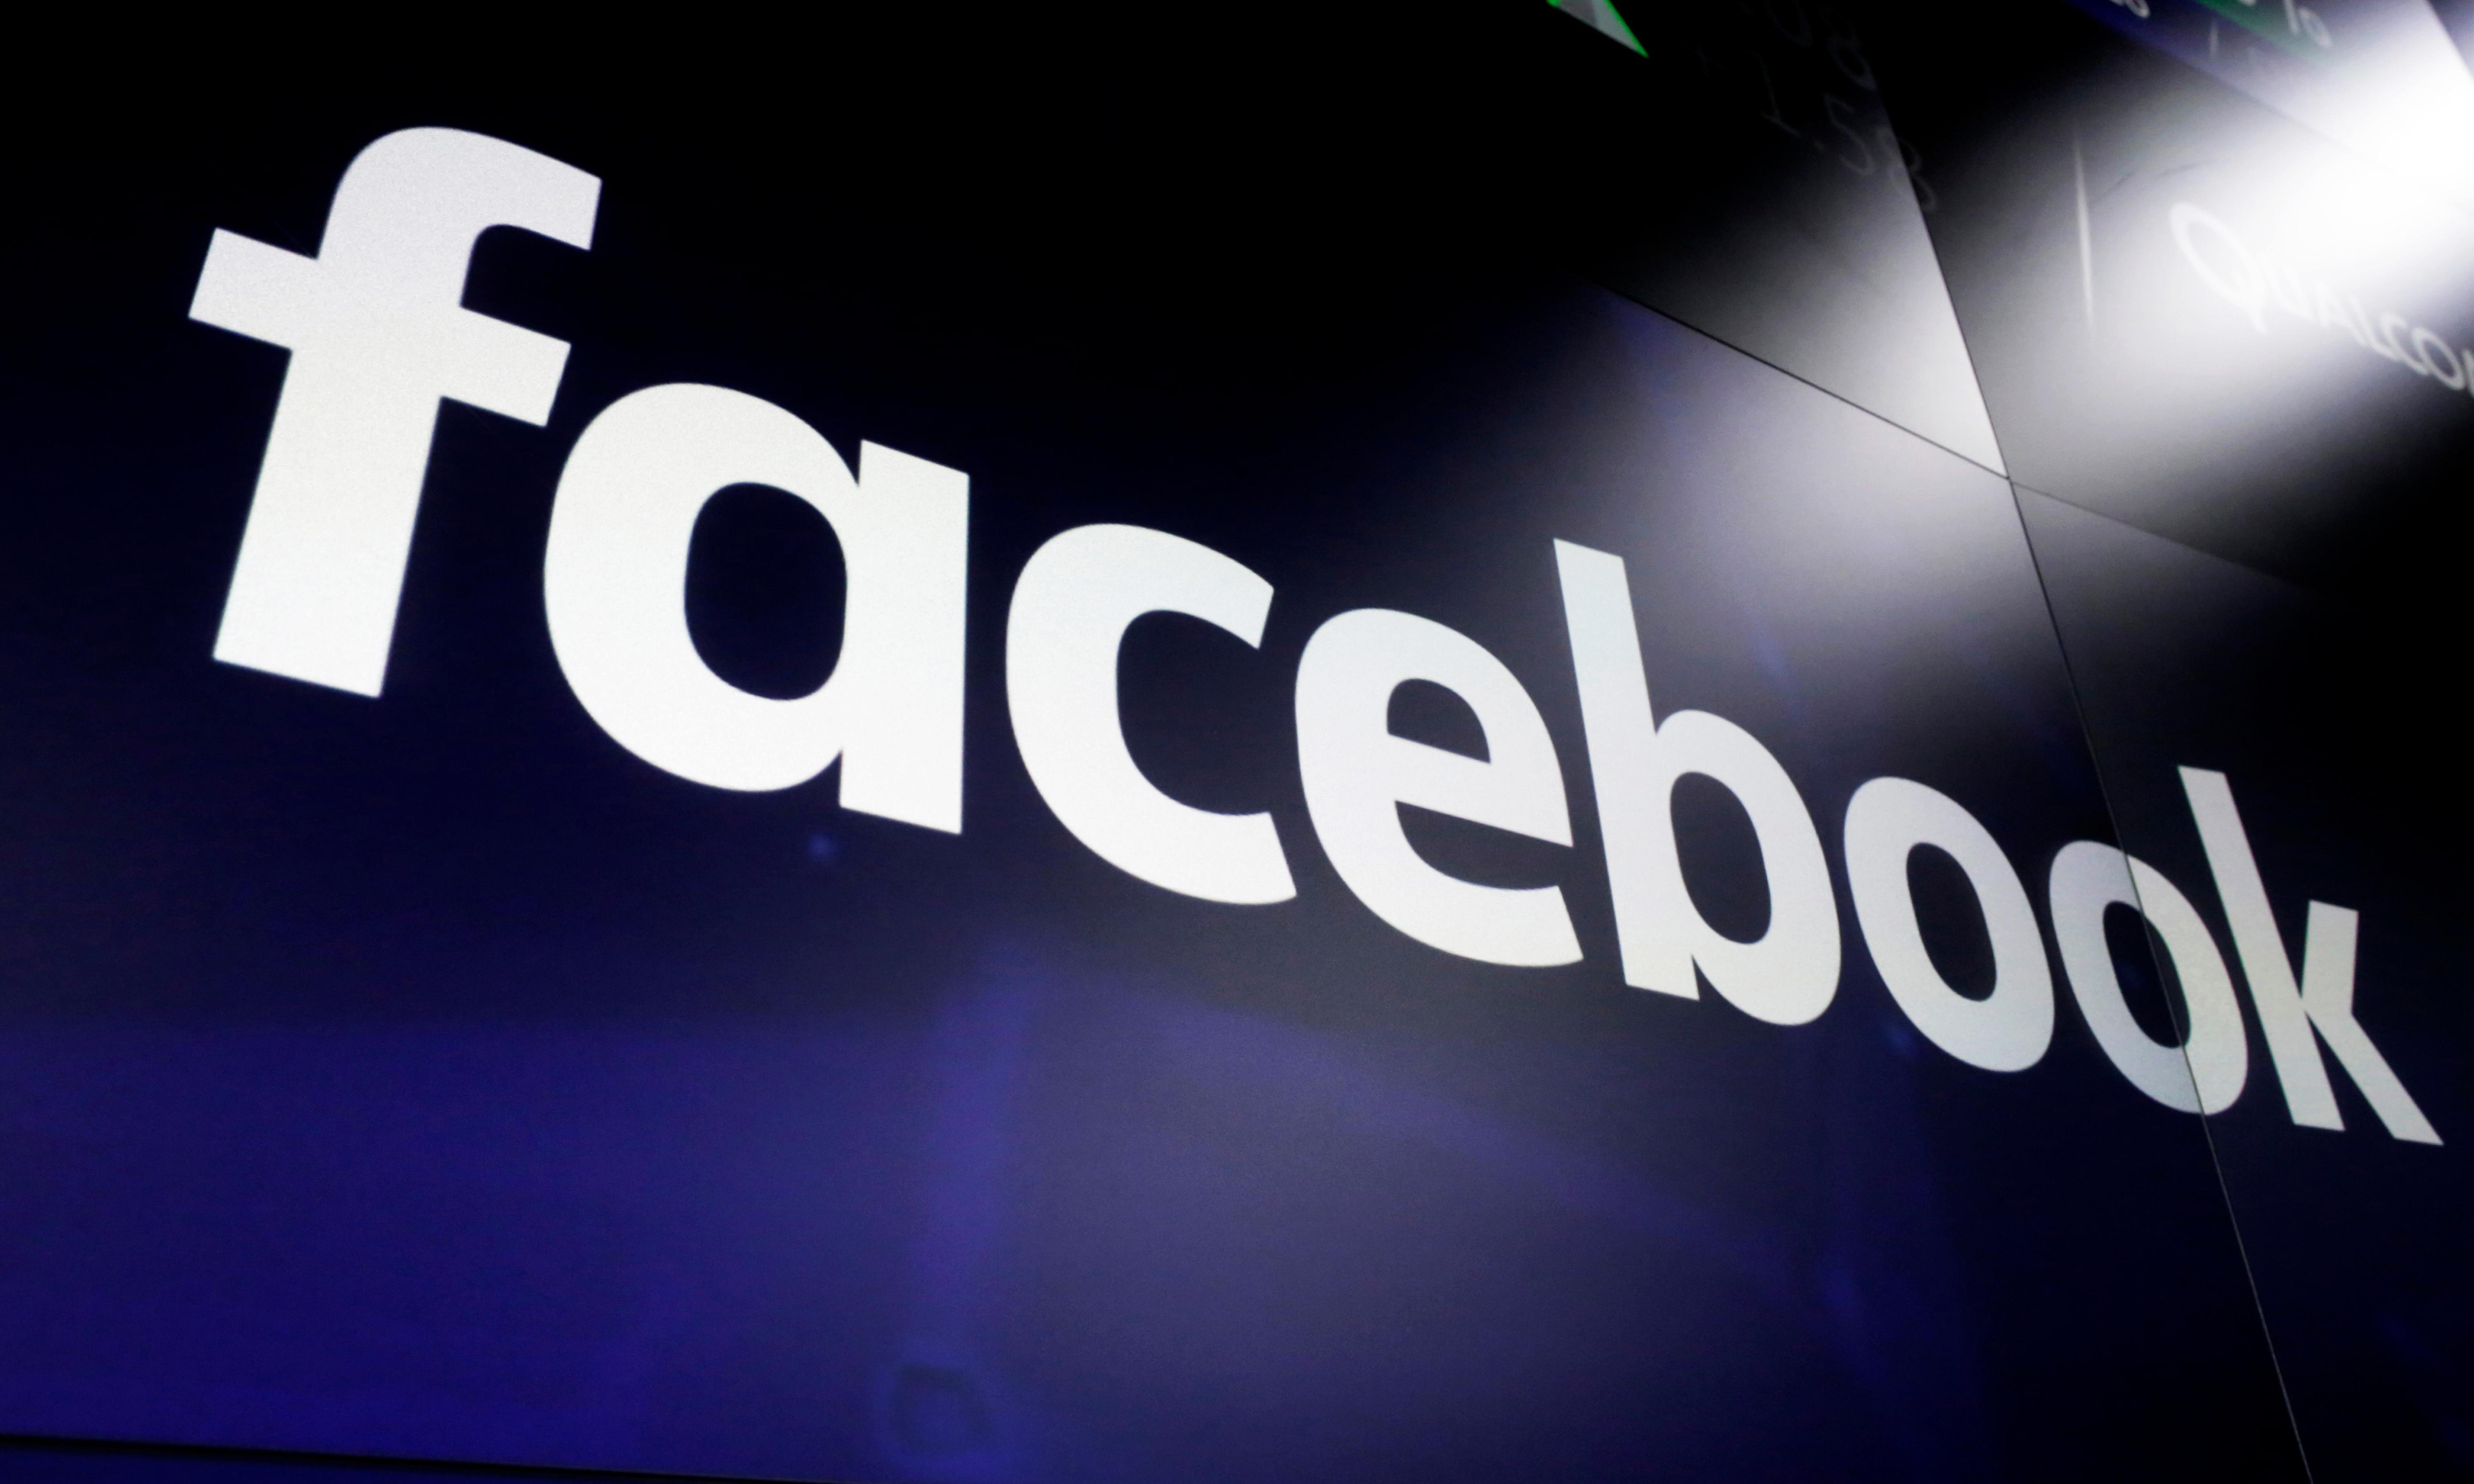 Italian regulator fines Facebook £8.9m for misleading users